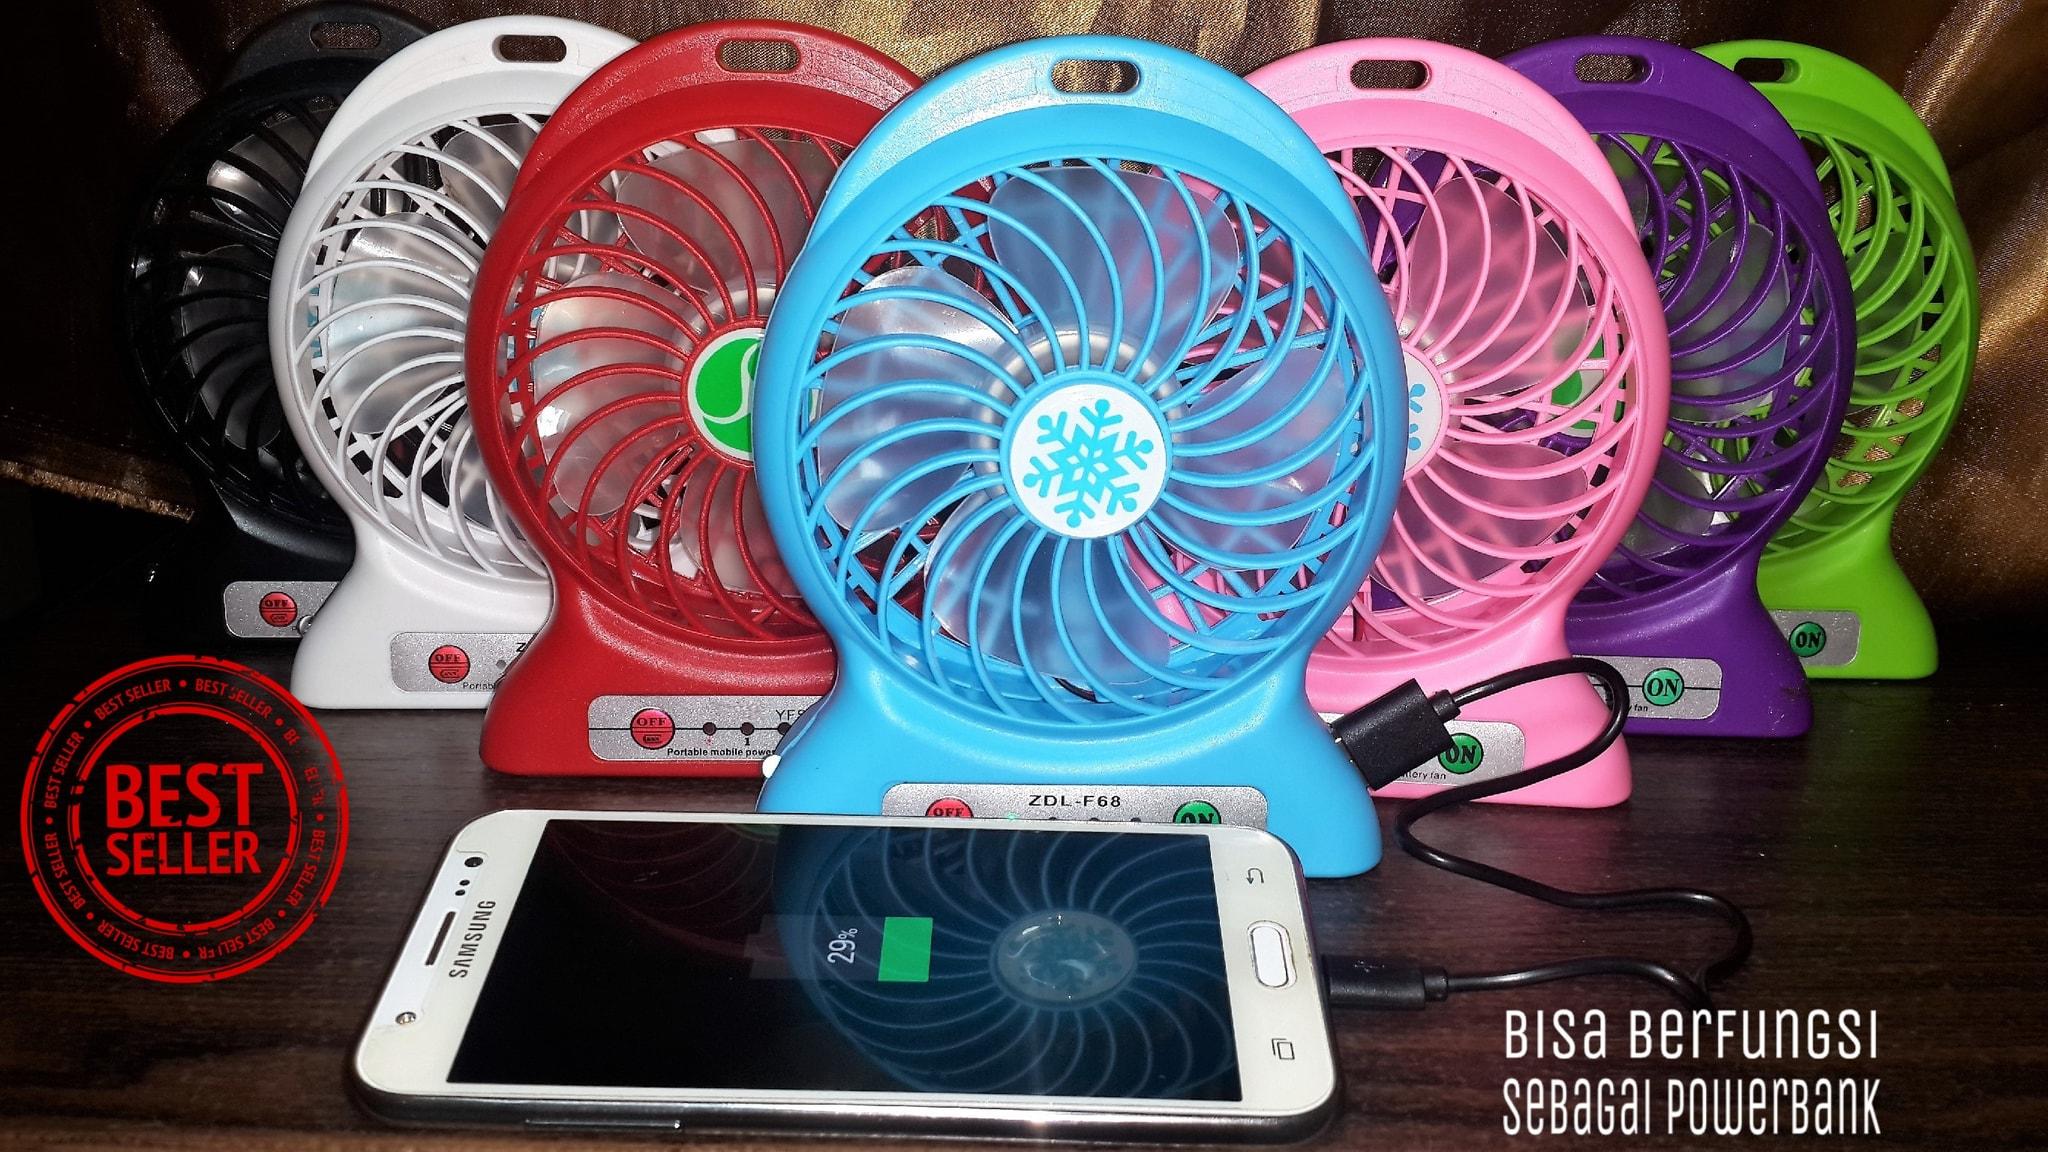 Junotshop Shop Line Kipas Angin Usb Mini Fan Powerbank Recharger Baterai 18650